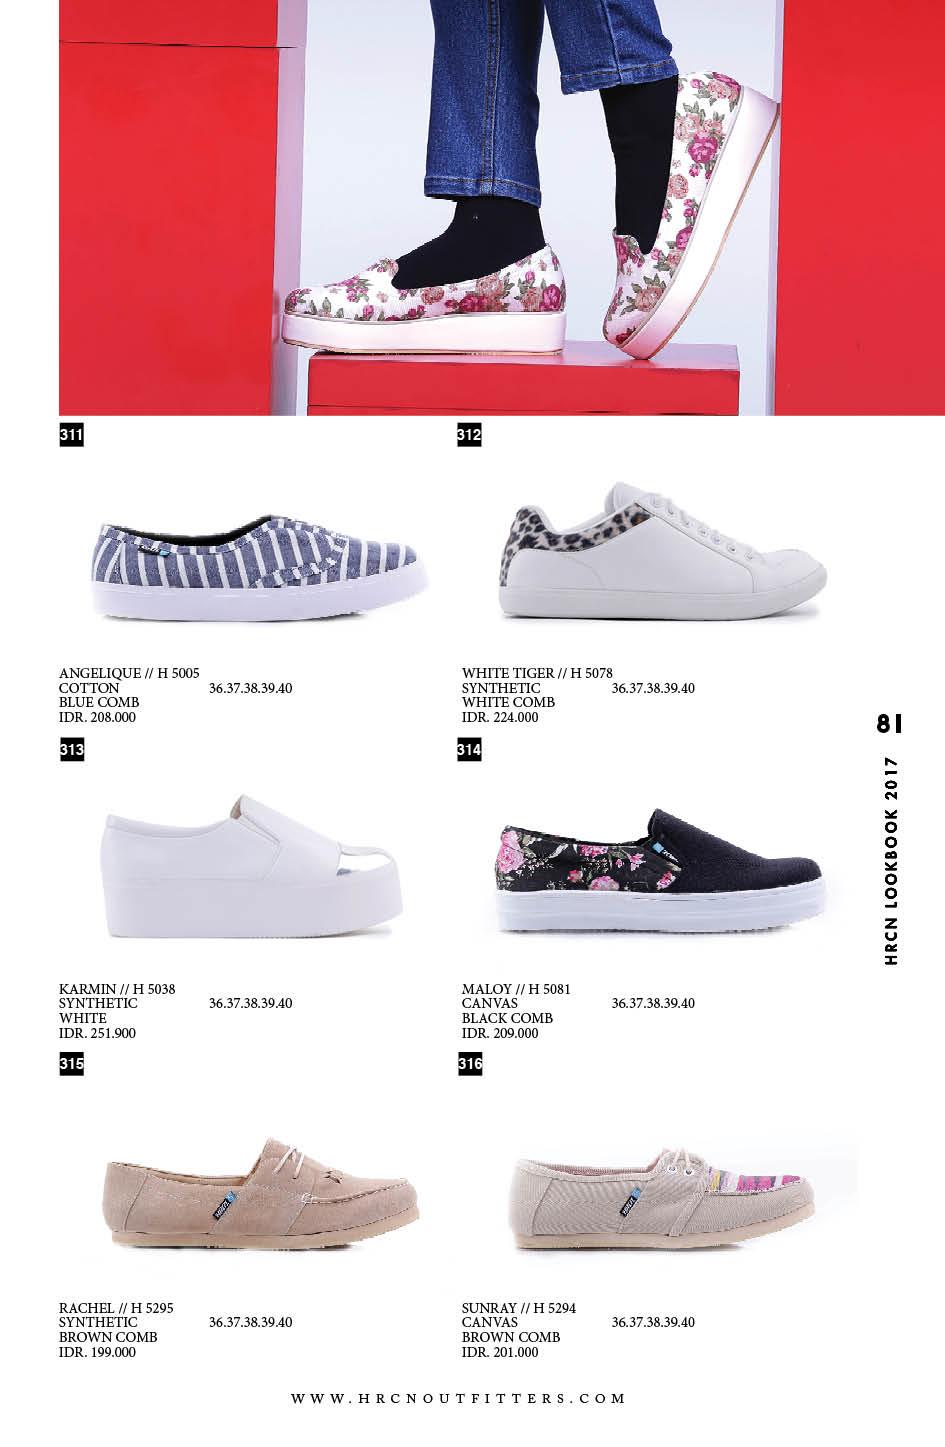 Katalog Hrcn 2017 2018 Fashion Distro Anak Muda Jaman Now H 1021 Black Kurta